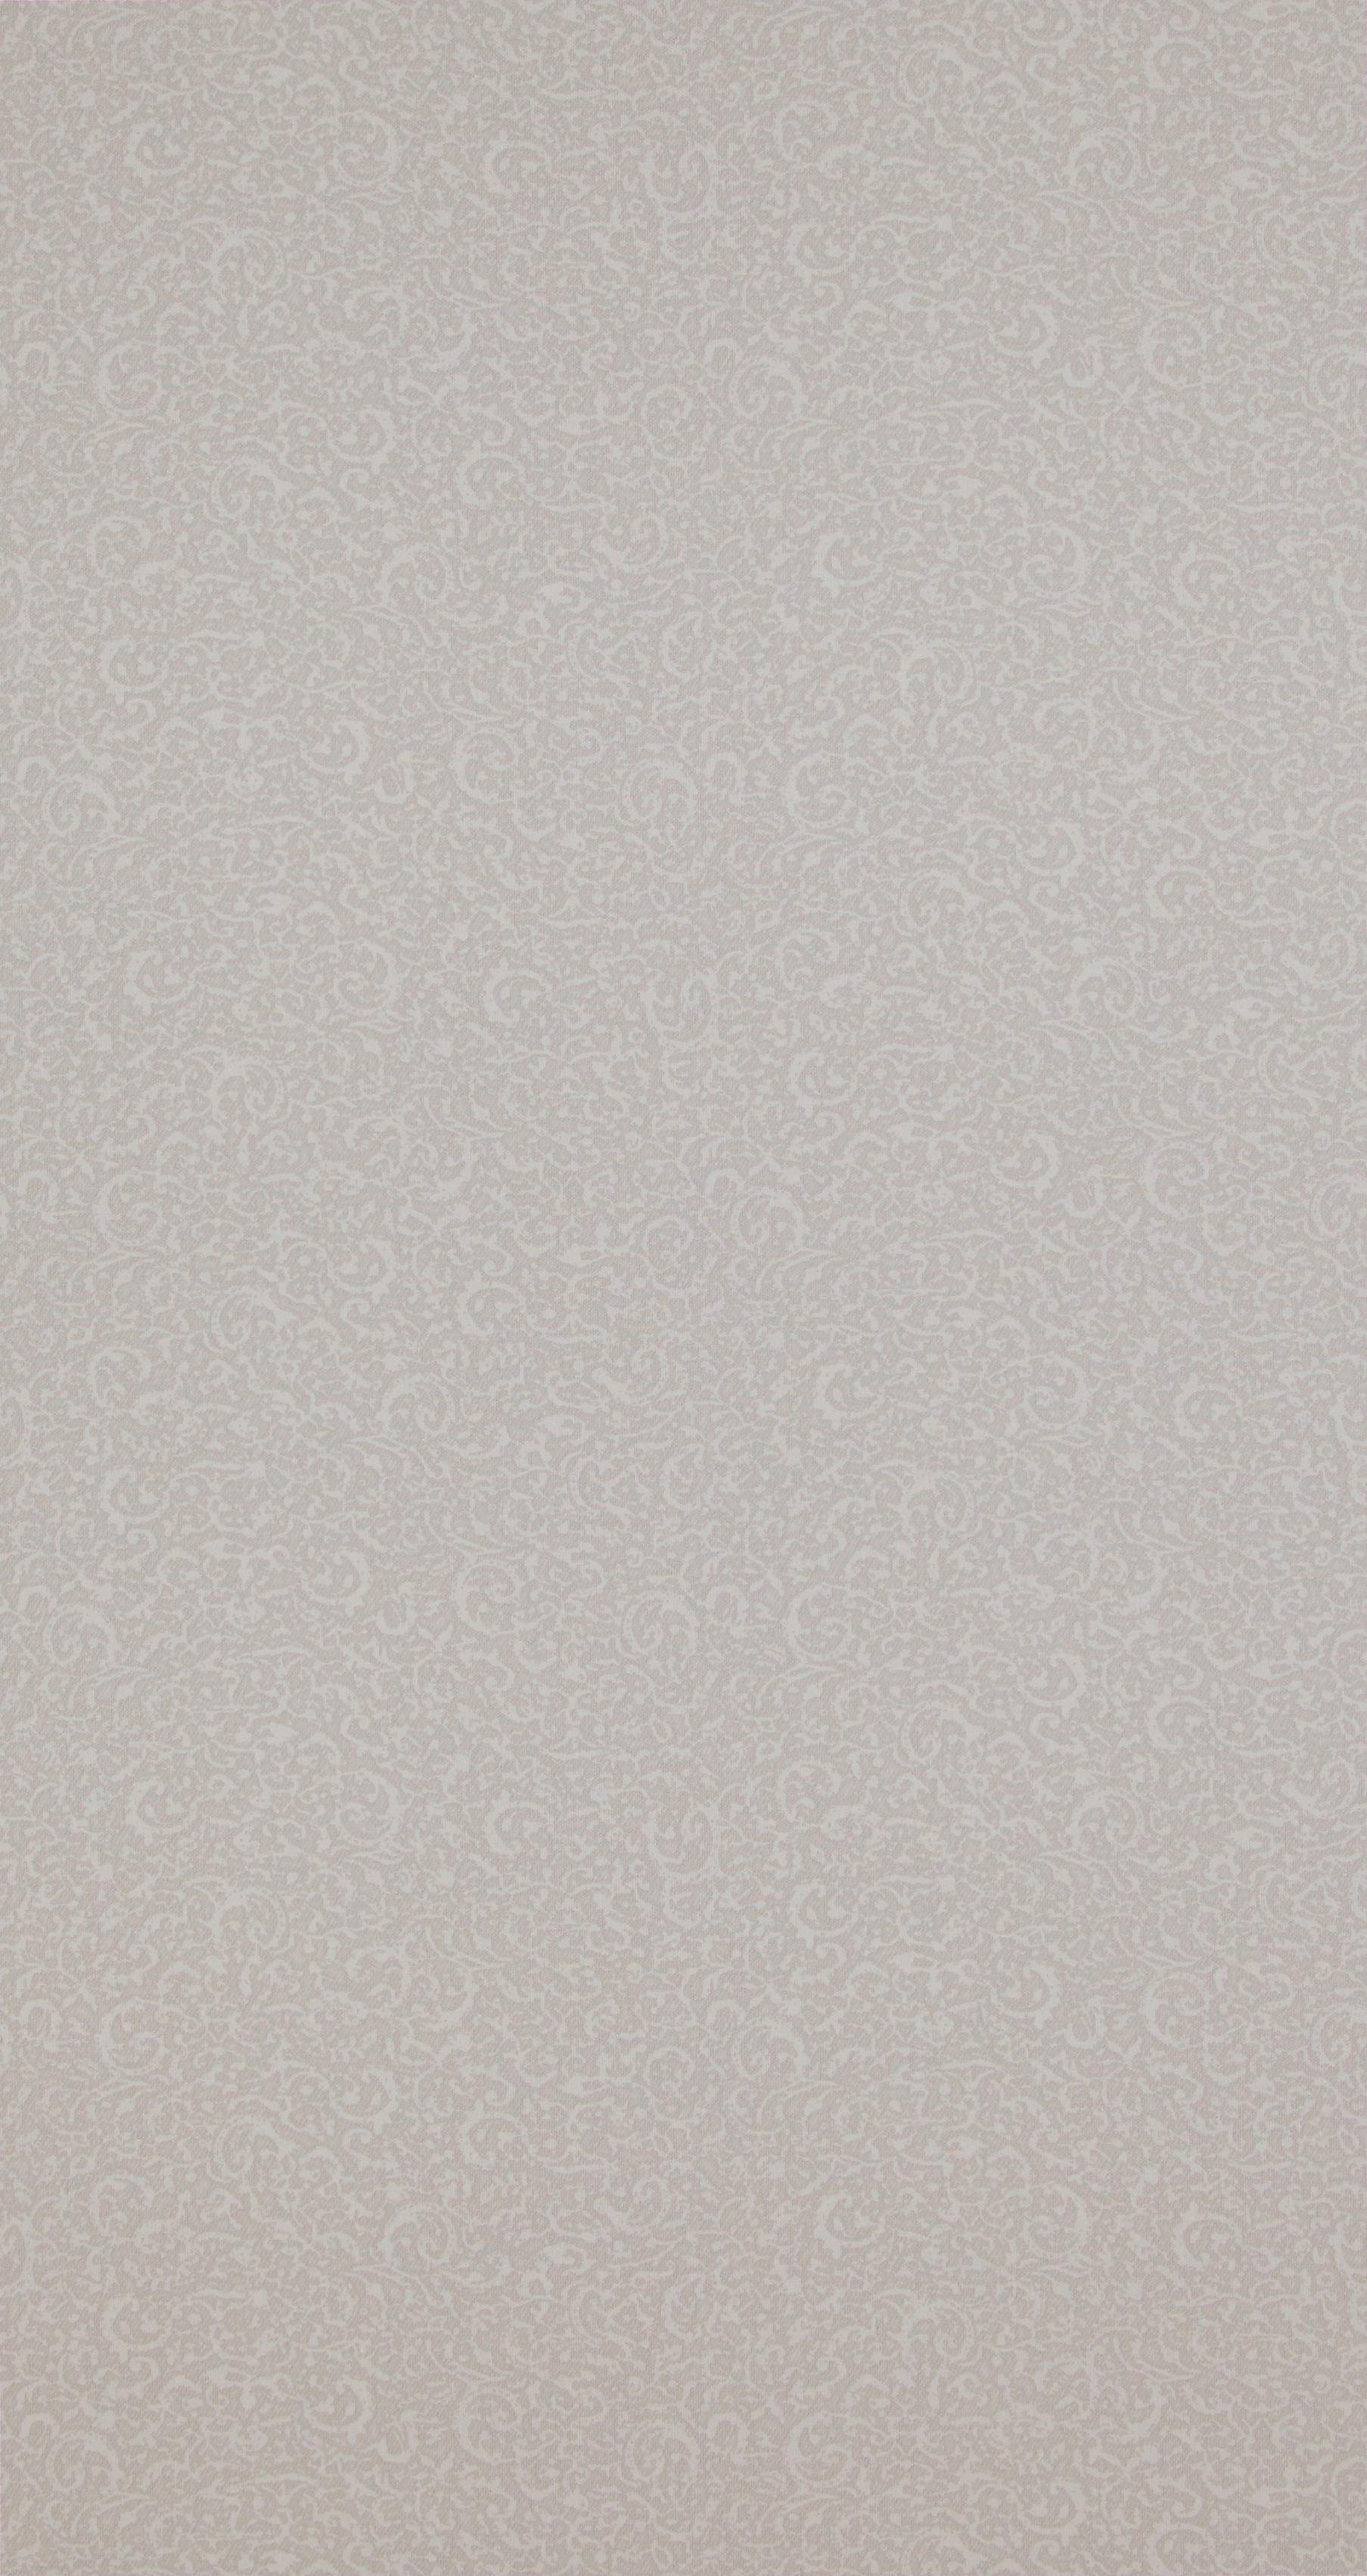 Обои  BN International,  коллекция Denim, артикул17612